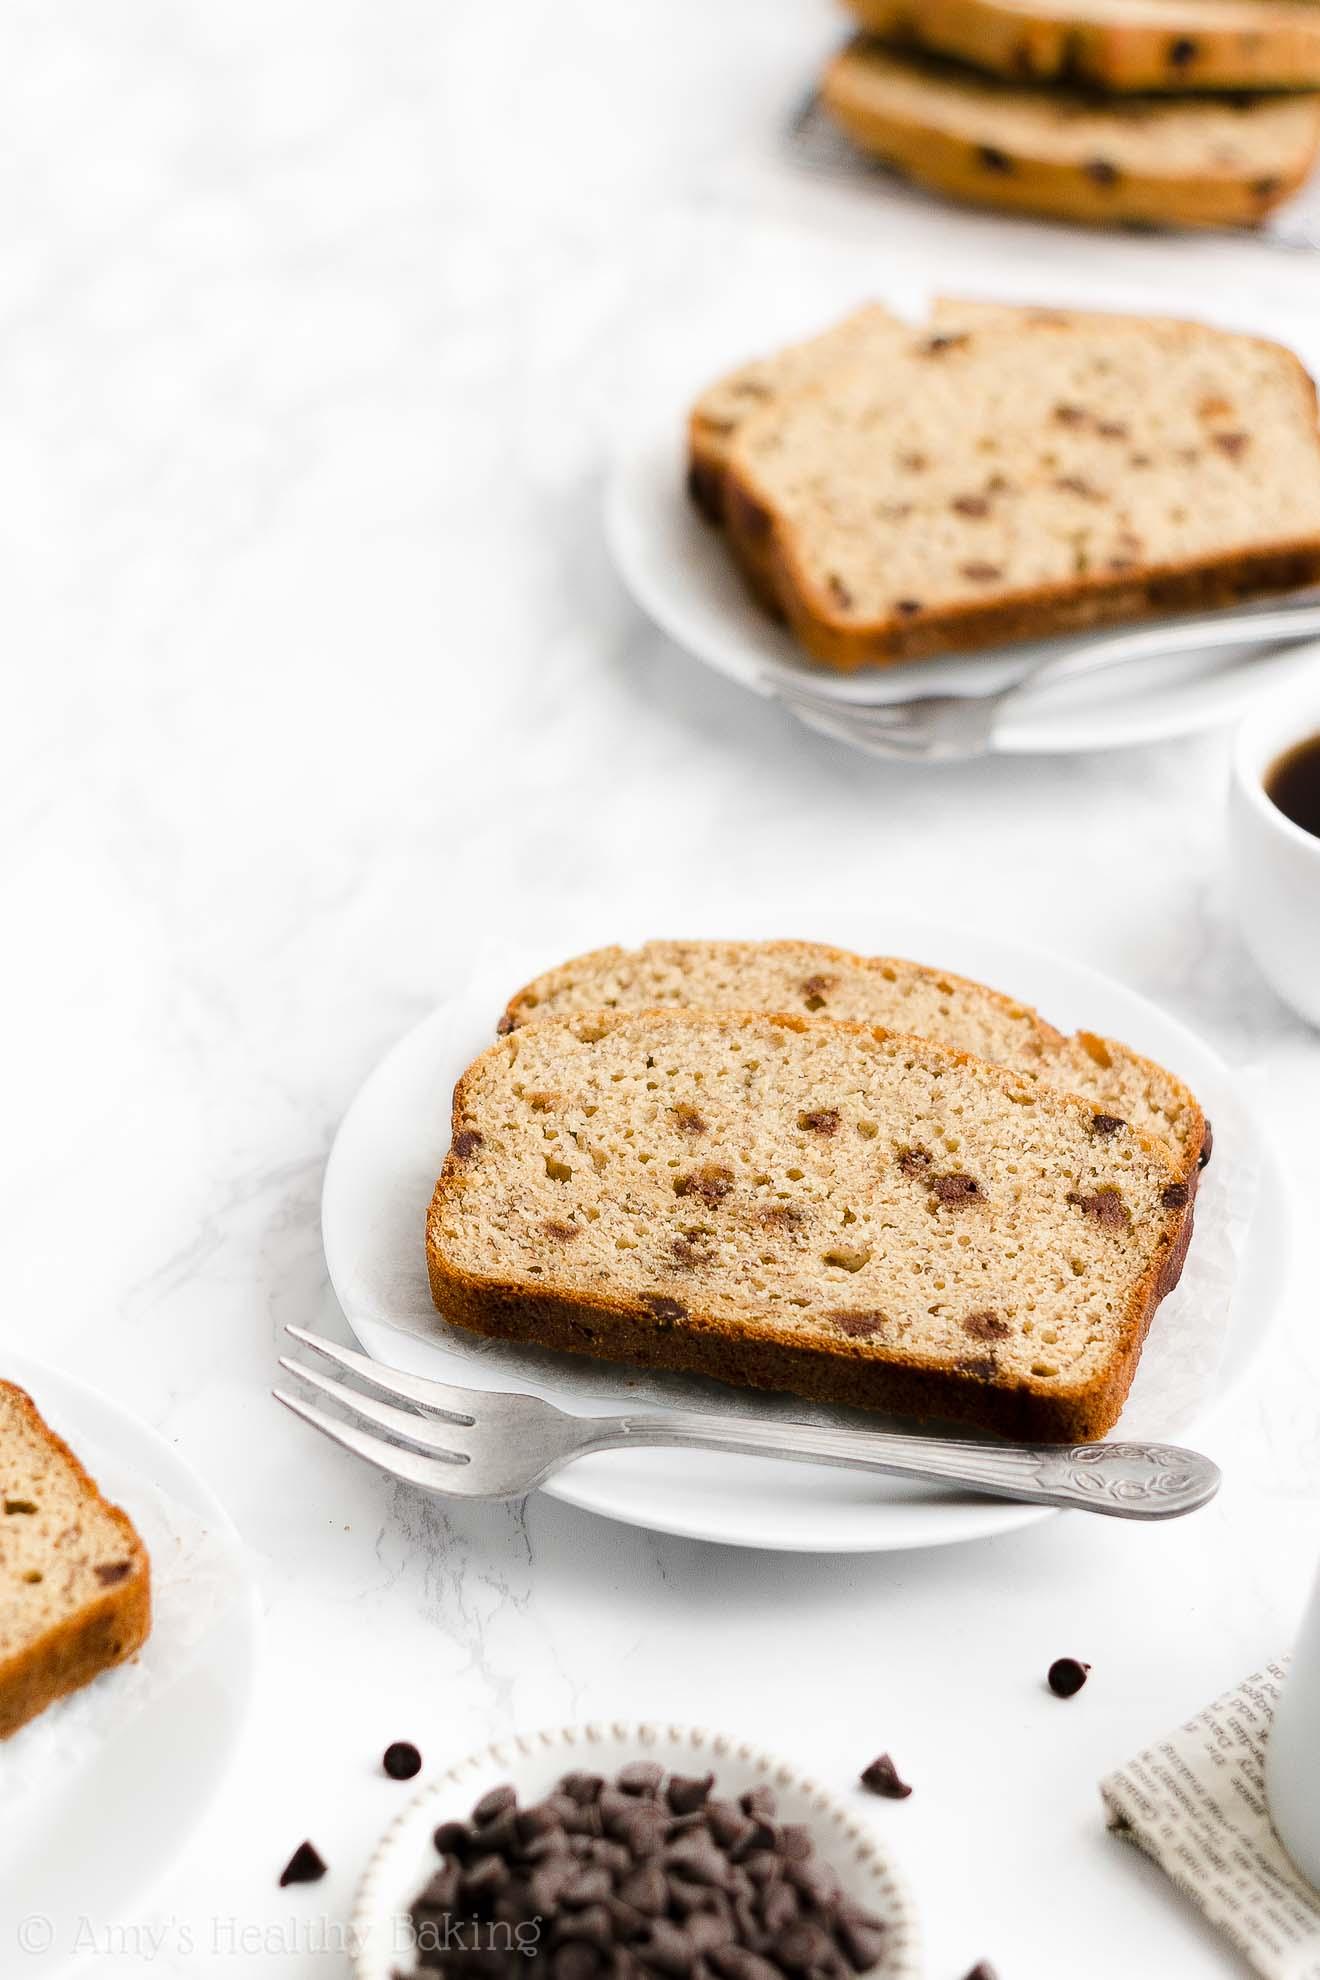 Best Easy Healthy Weight Watchers Sugar Free Chocolate Chip Banana Bread